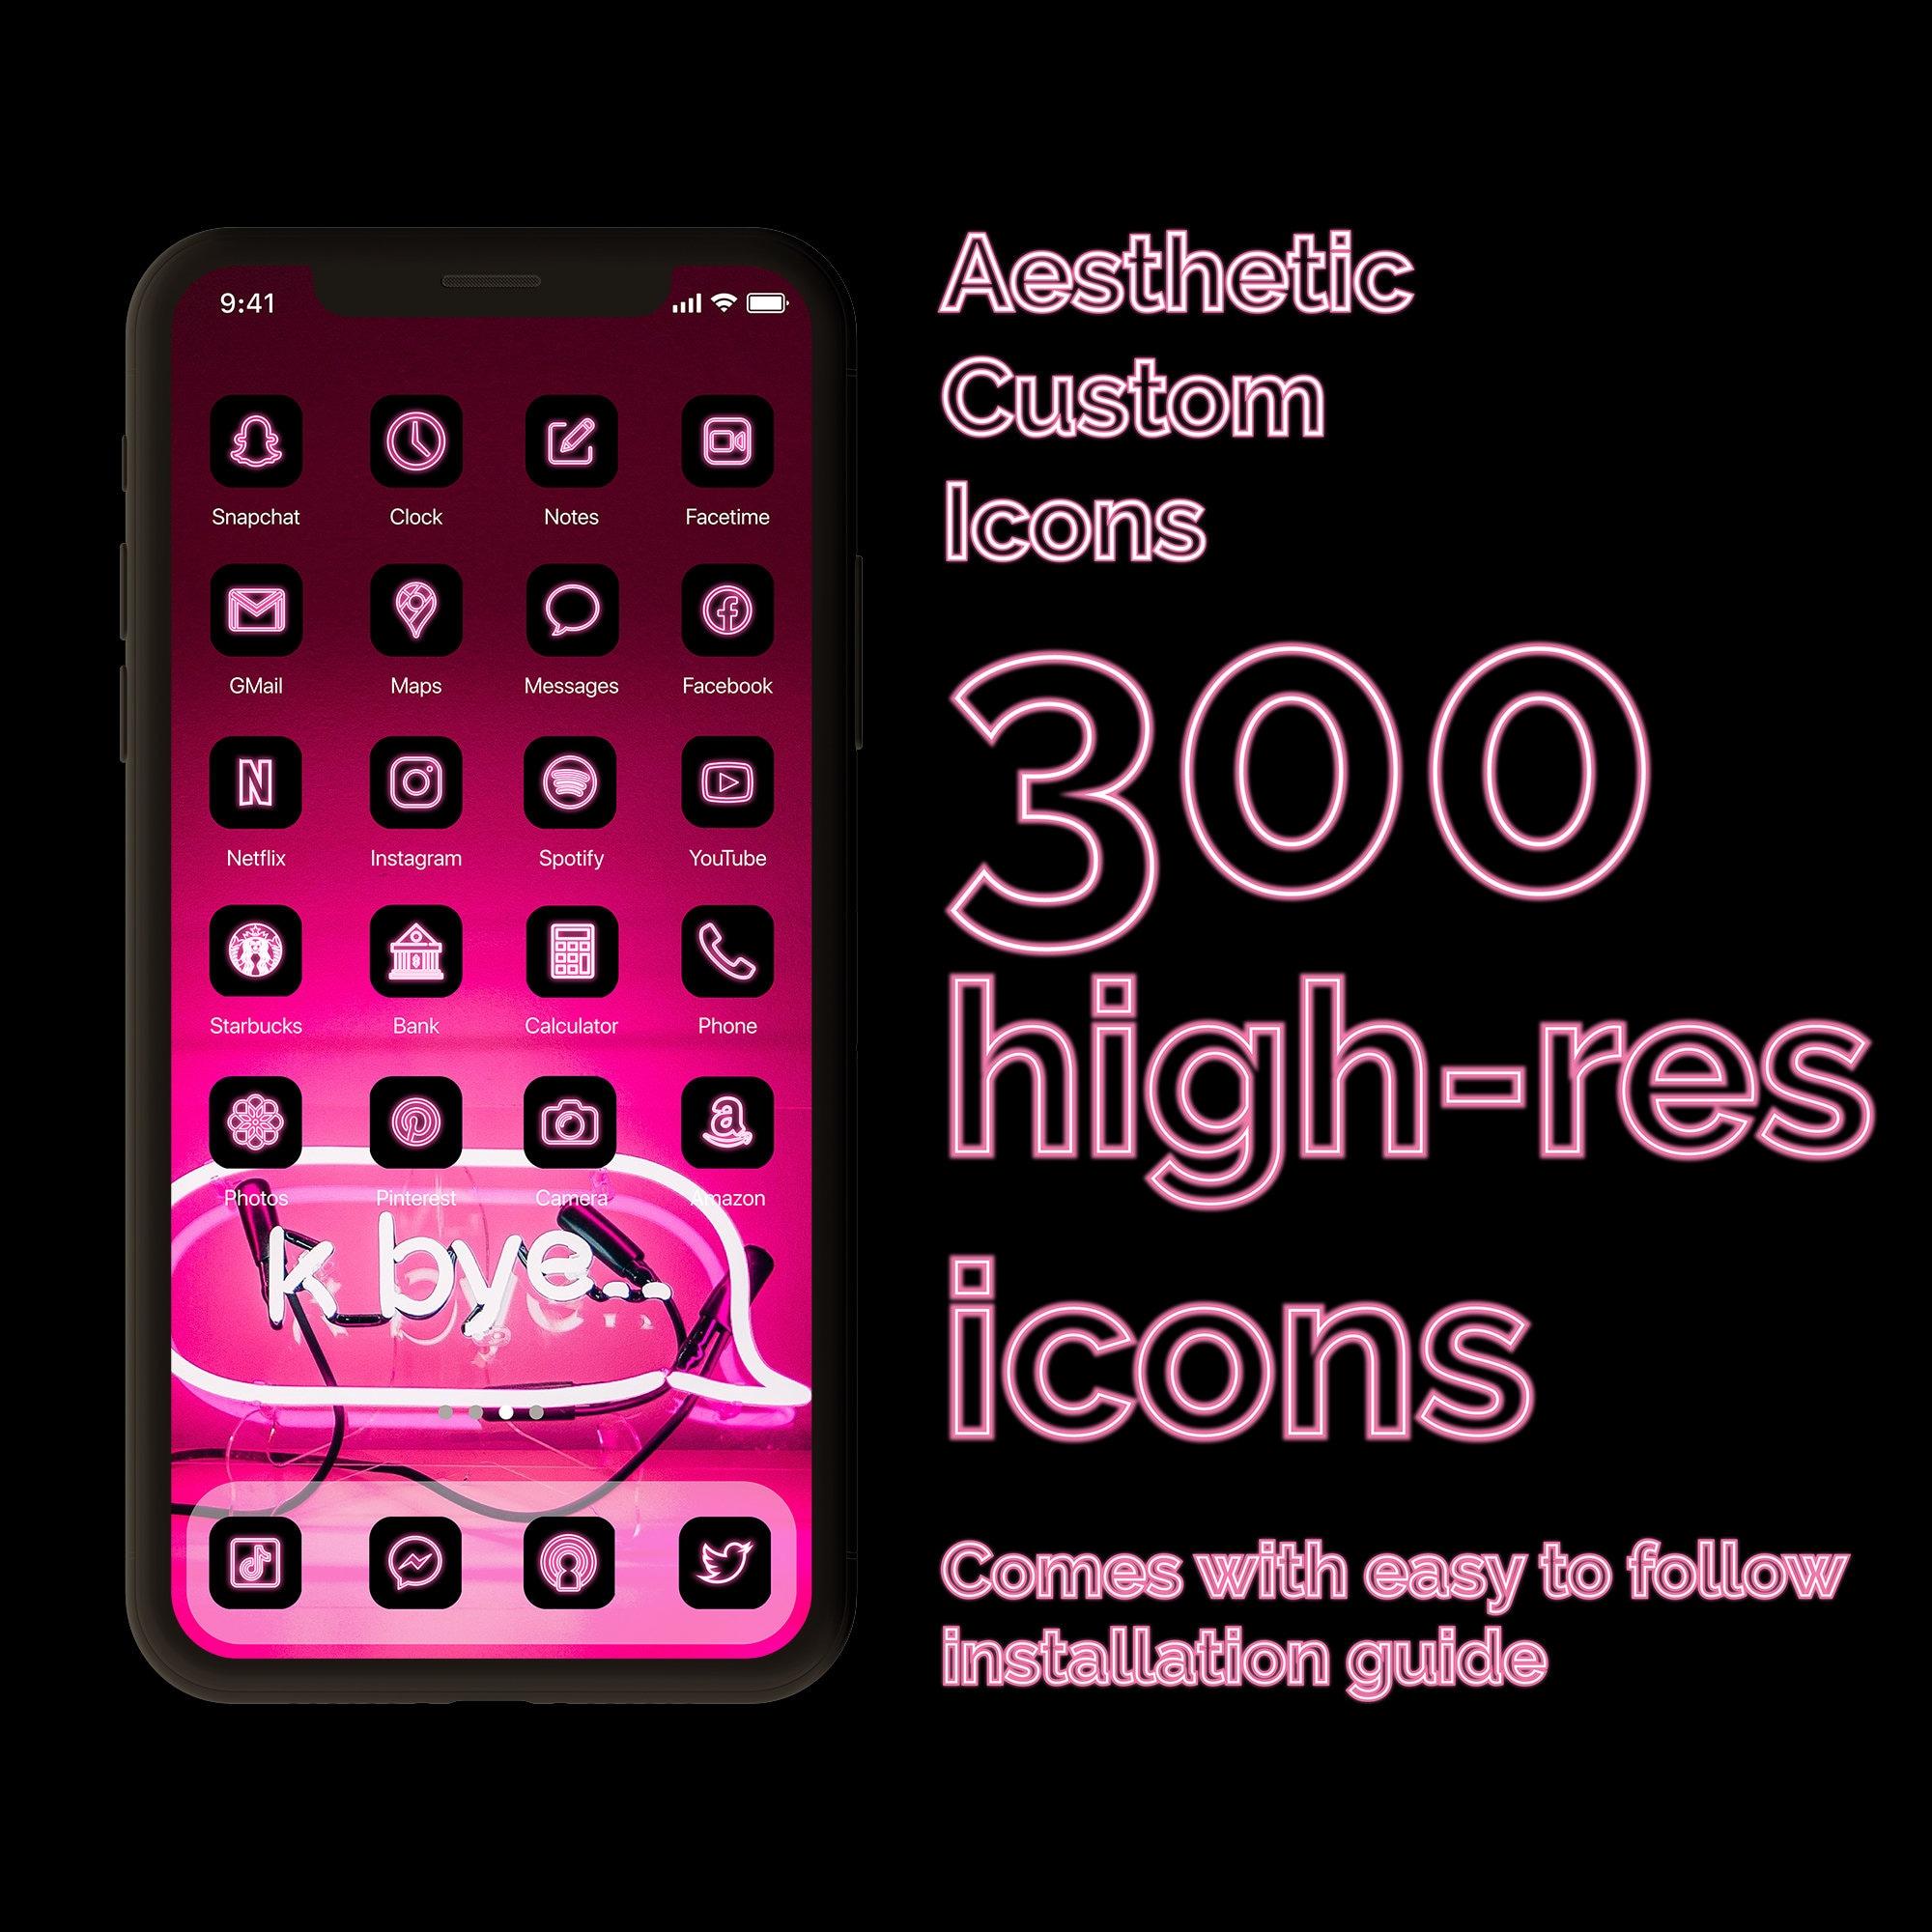 Neon Pink   21 Aesthetic Custom App icons pack   iPhone iOS 21   Minimal  App Covers   Minimalistic Retro   Futuristic   Wallpapers